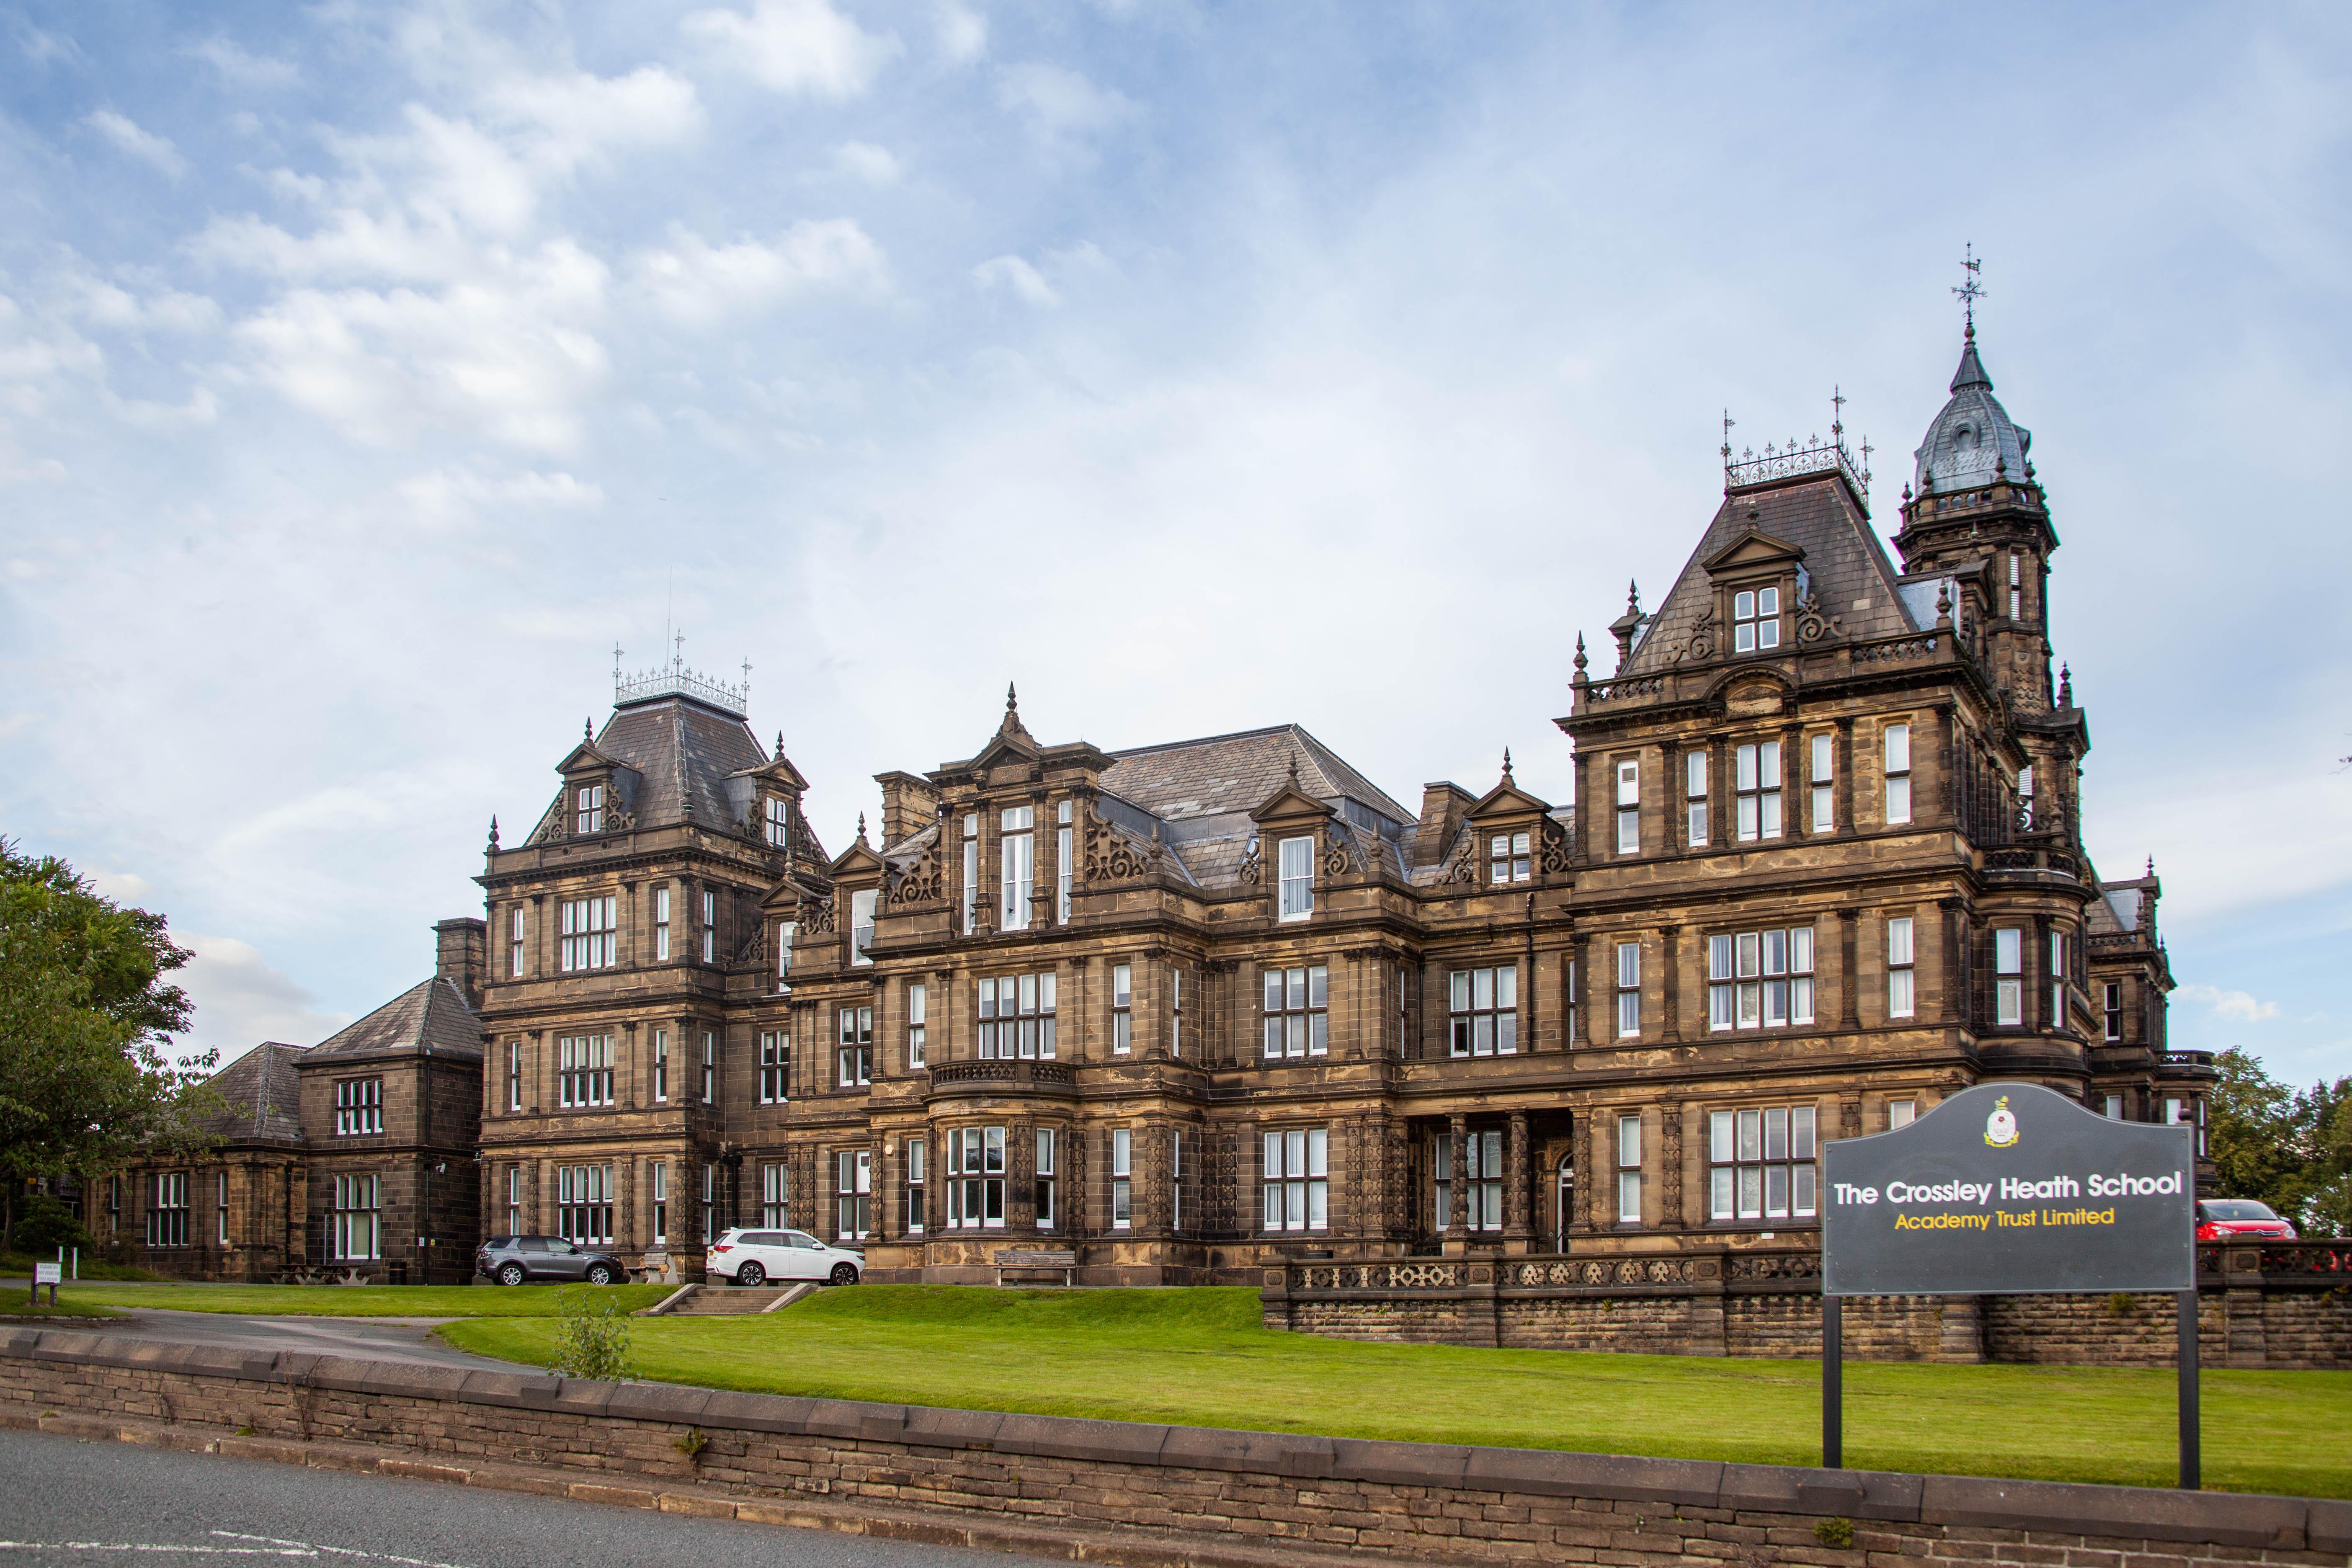 crossley_heath_school